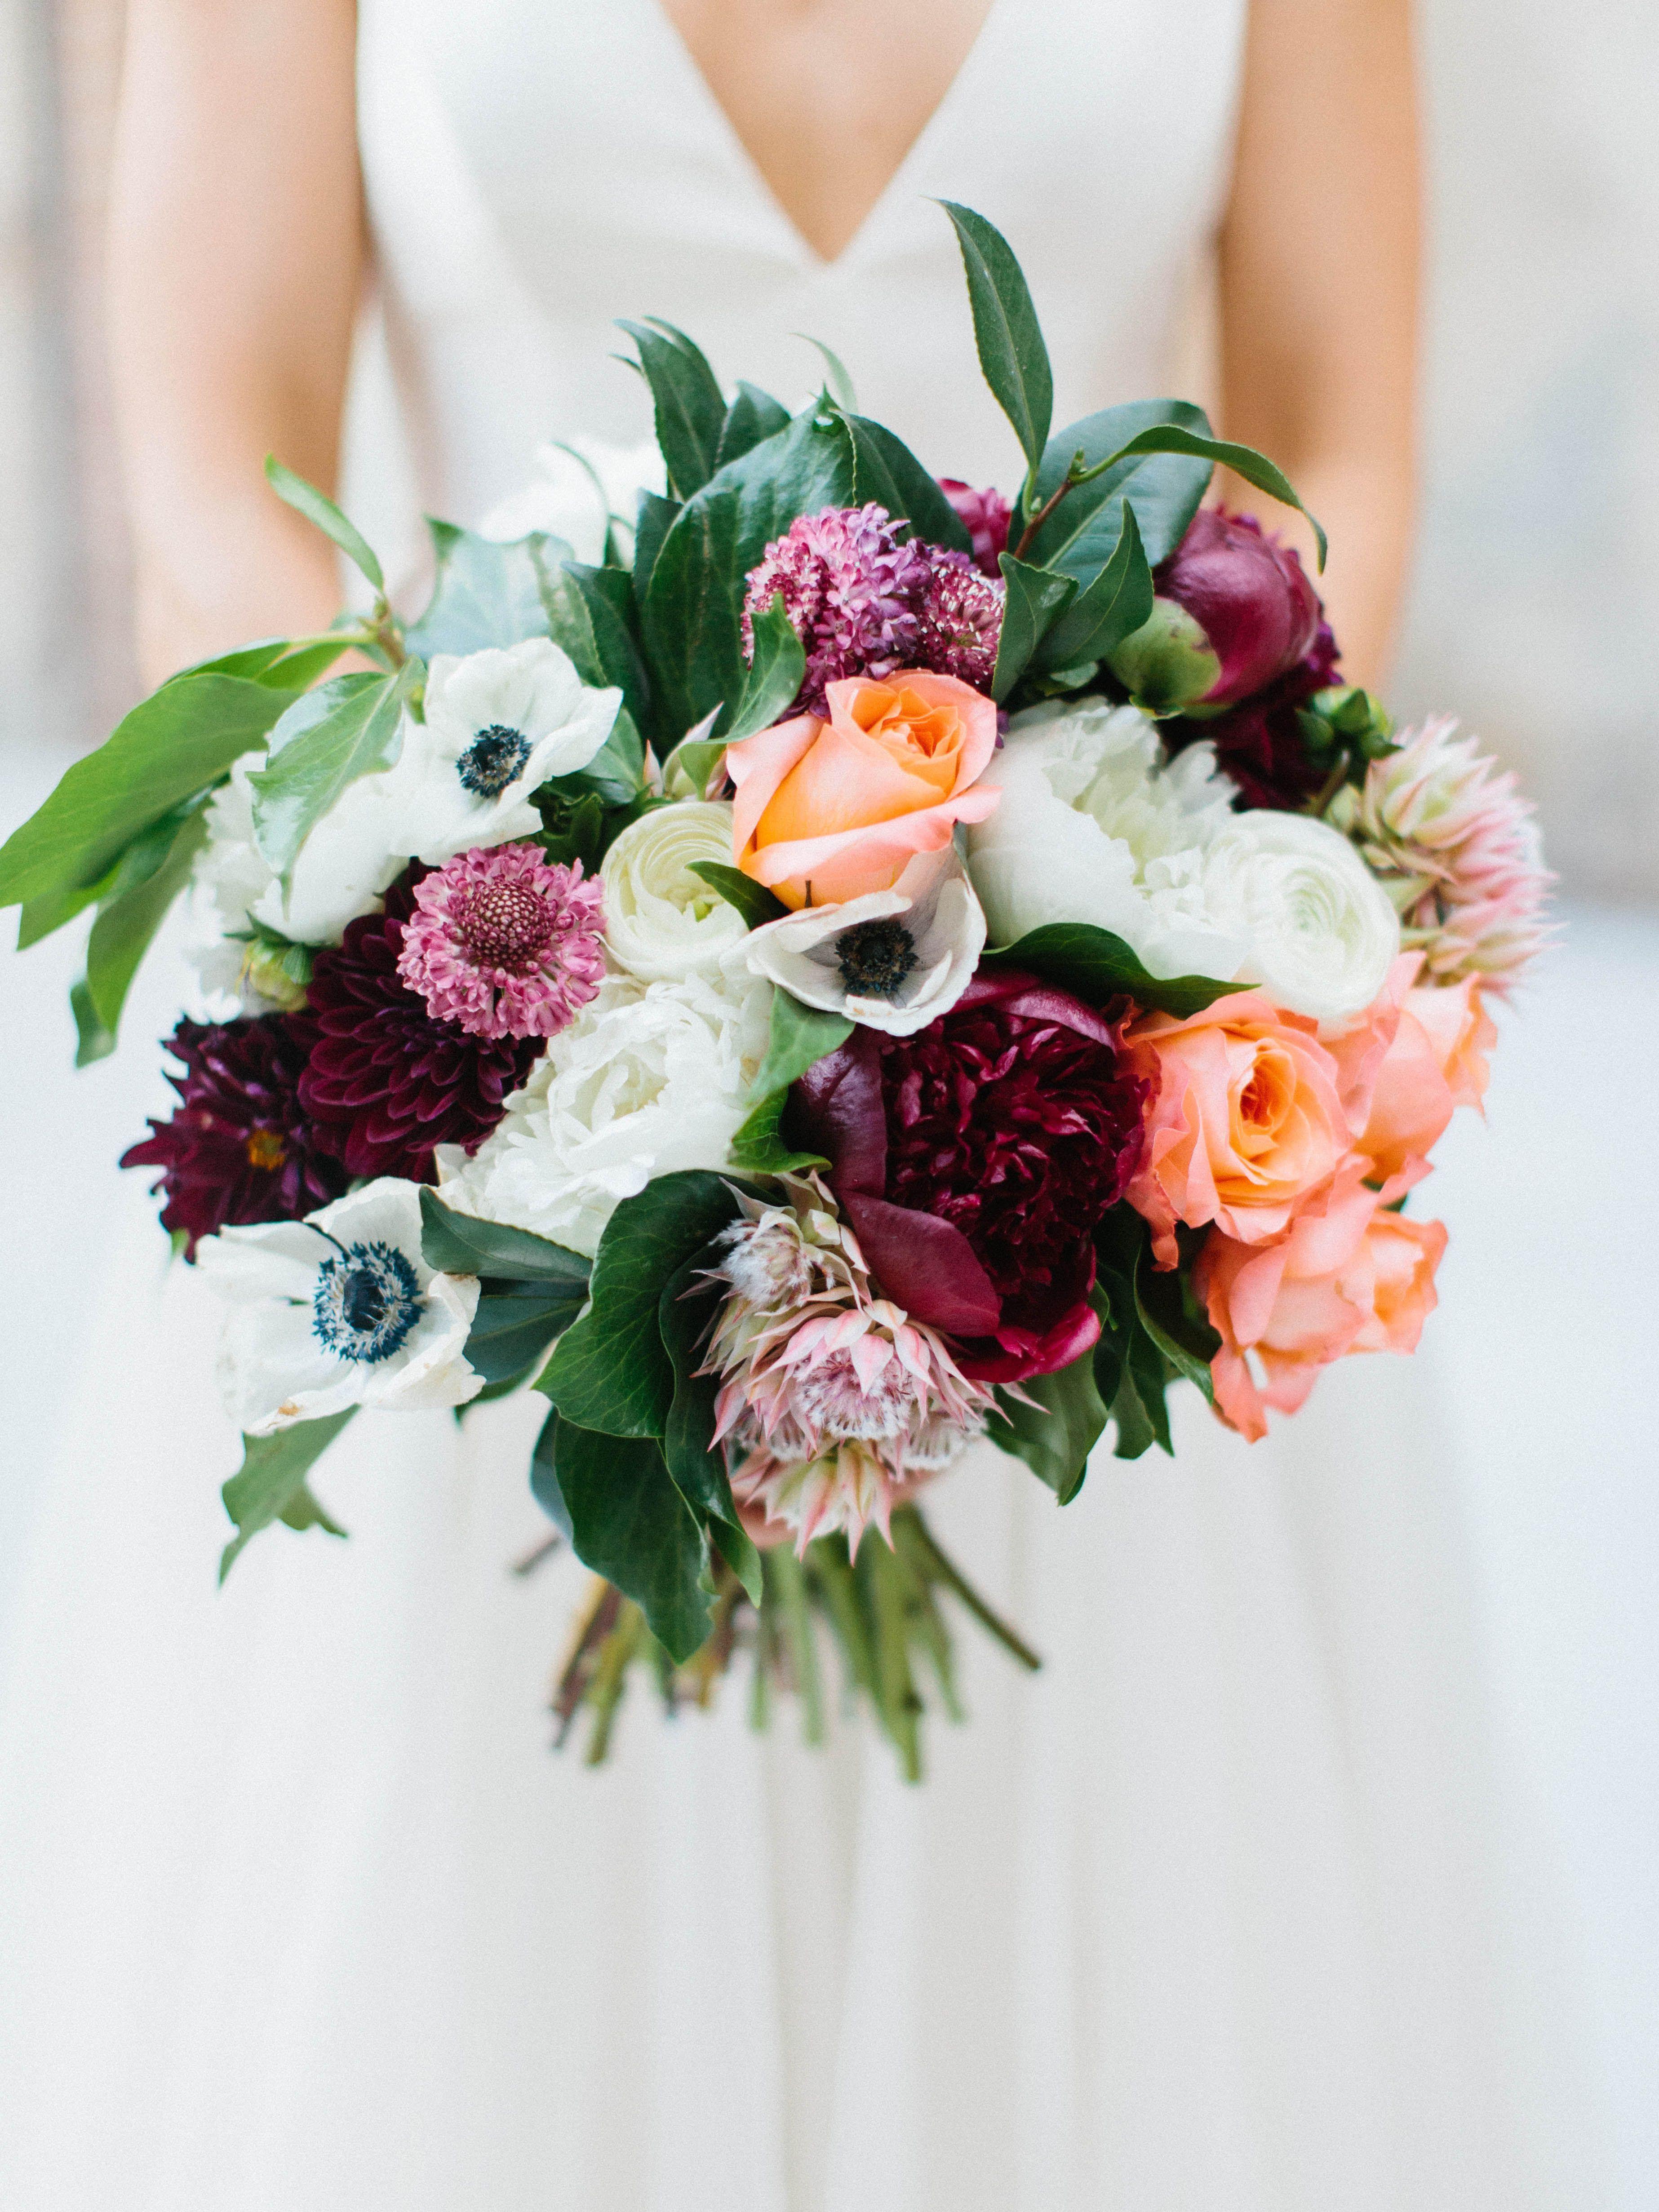 25 Fall Wedding Bouquets - Fall Flowers for Wedding ...